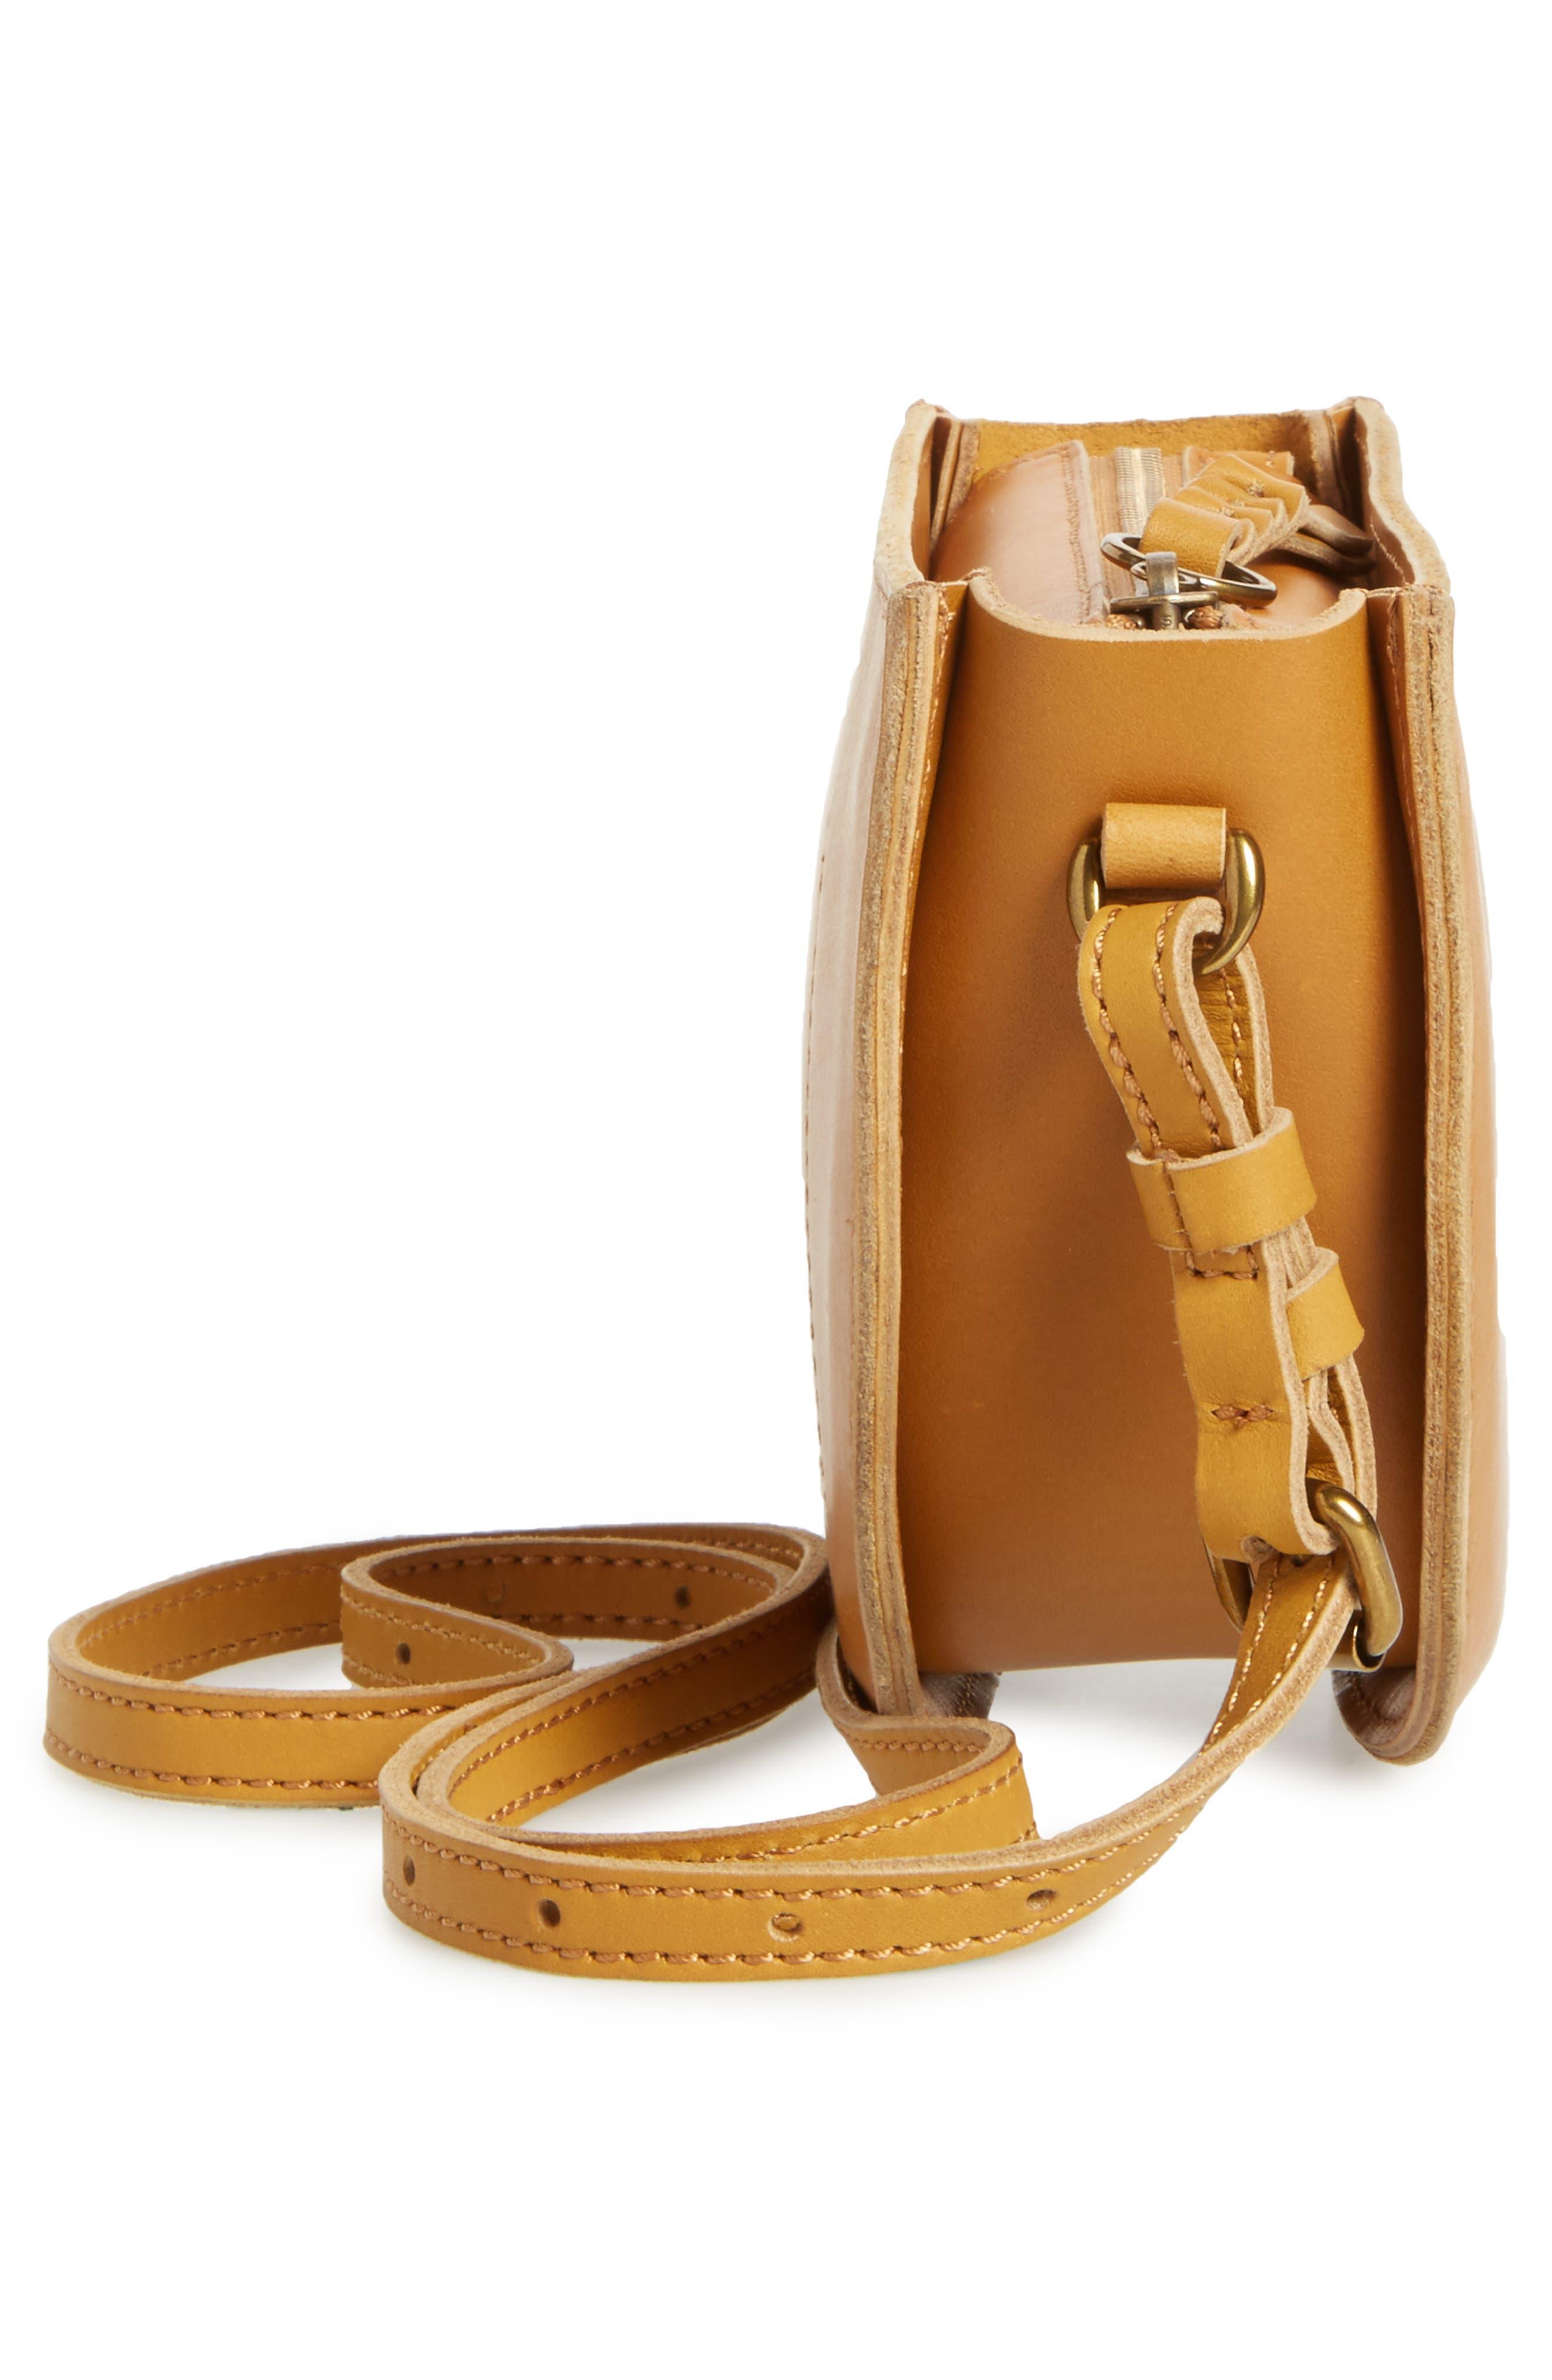 Juniper Vachetta Leather Half Moon Crossbody Bag,                             Alternate thumbnail 14, color,